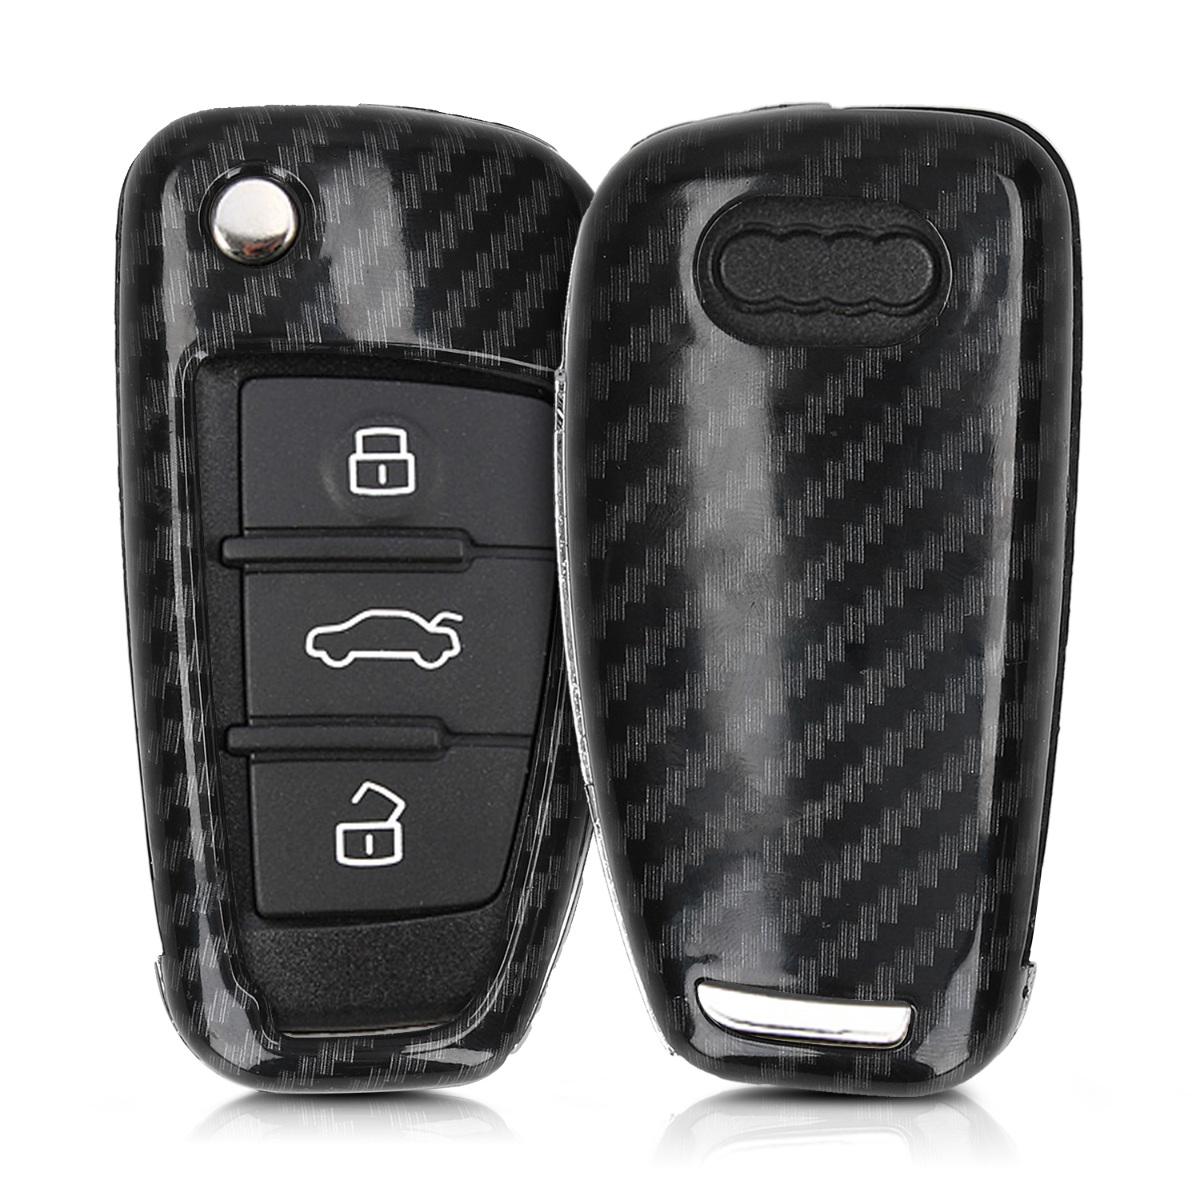 KW Σκληρή Θήκη Κλειδιού Audi - 3 Κουμπιά - Black (49669.01)